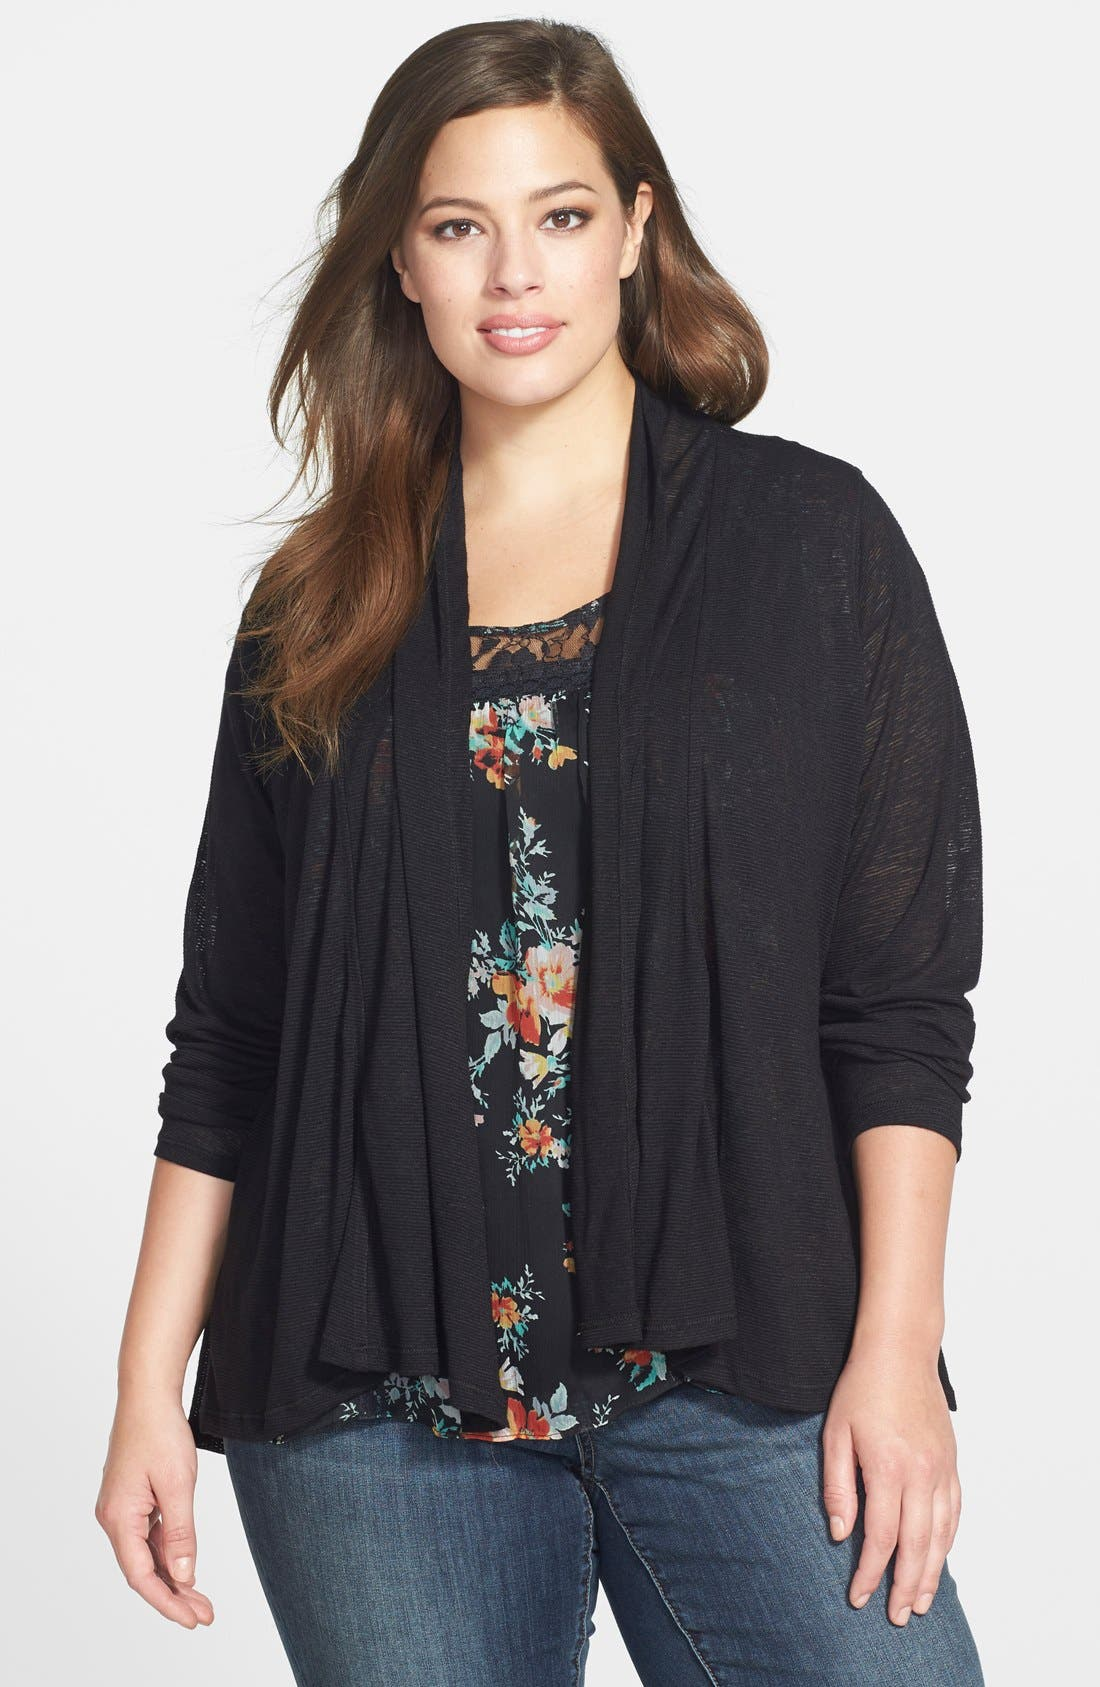 Alternate Image 1 Selected - Jessica Simpson 'Veronica' Chiffon Inset Cardigan (Plus Size)